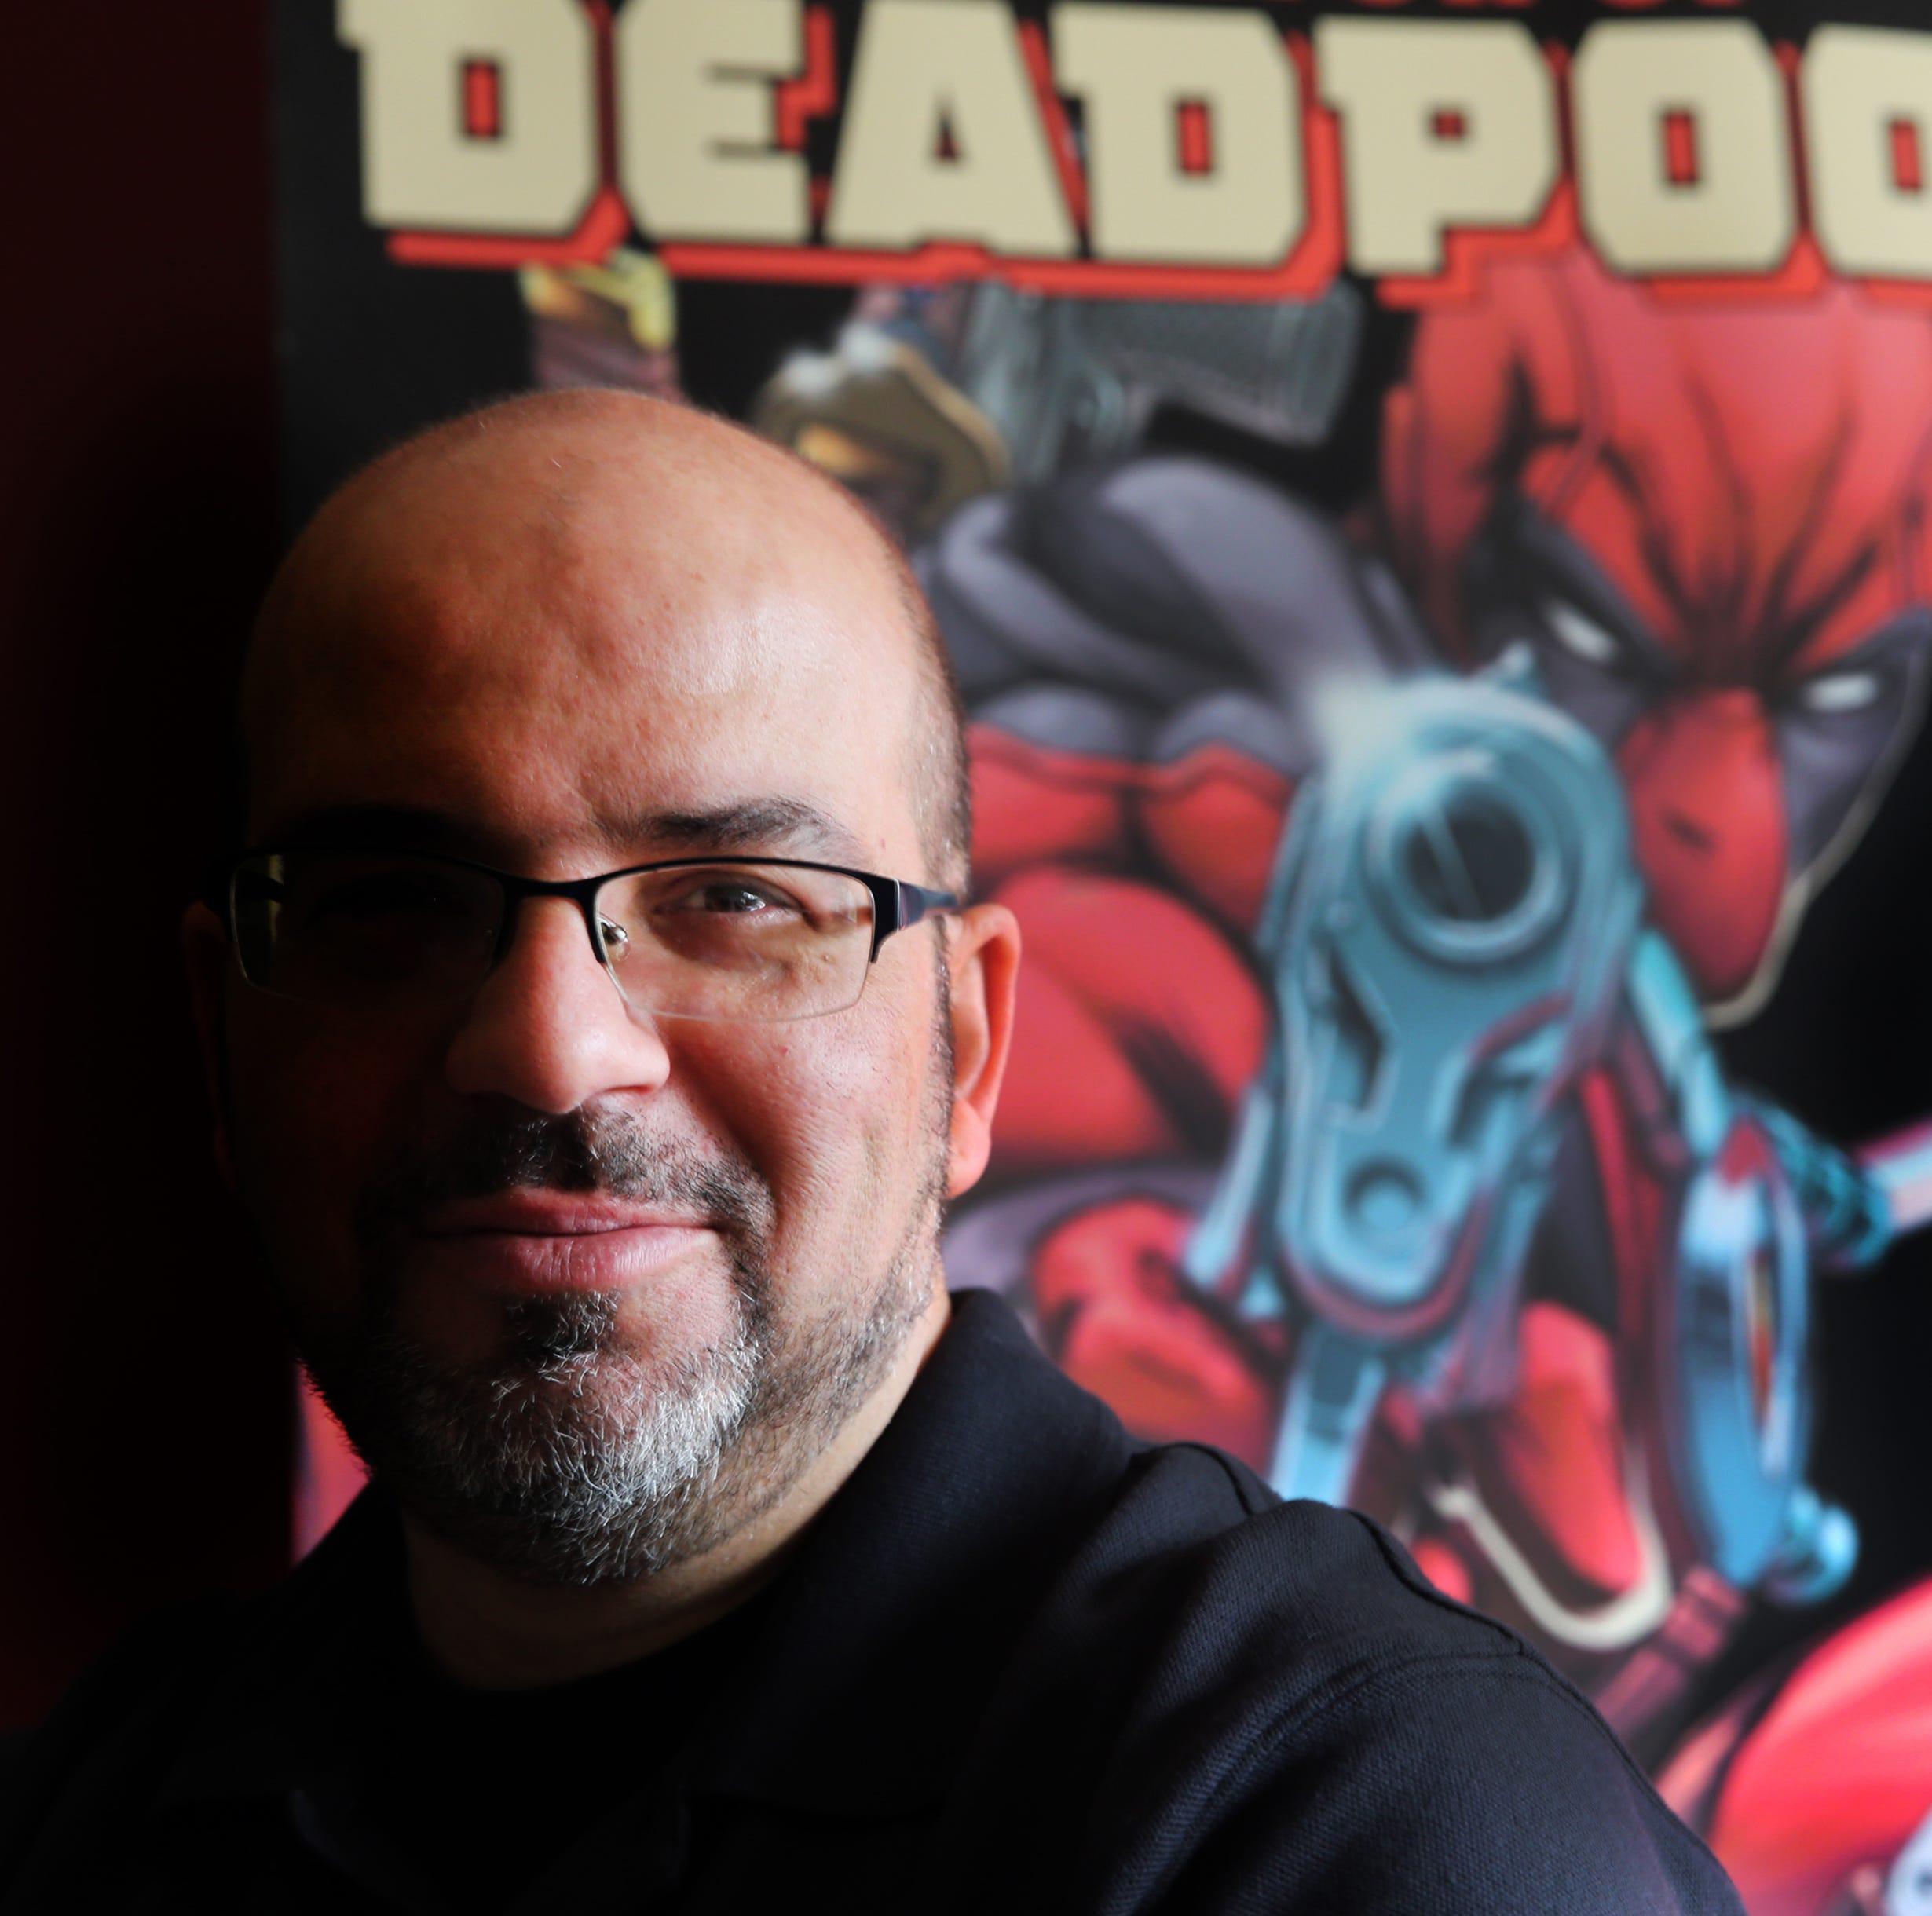 Deadpool co-creator appearing Saturday at River Region Comic Con